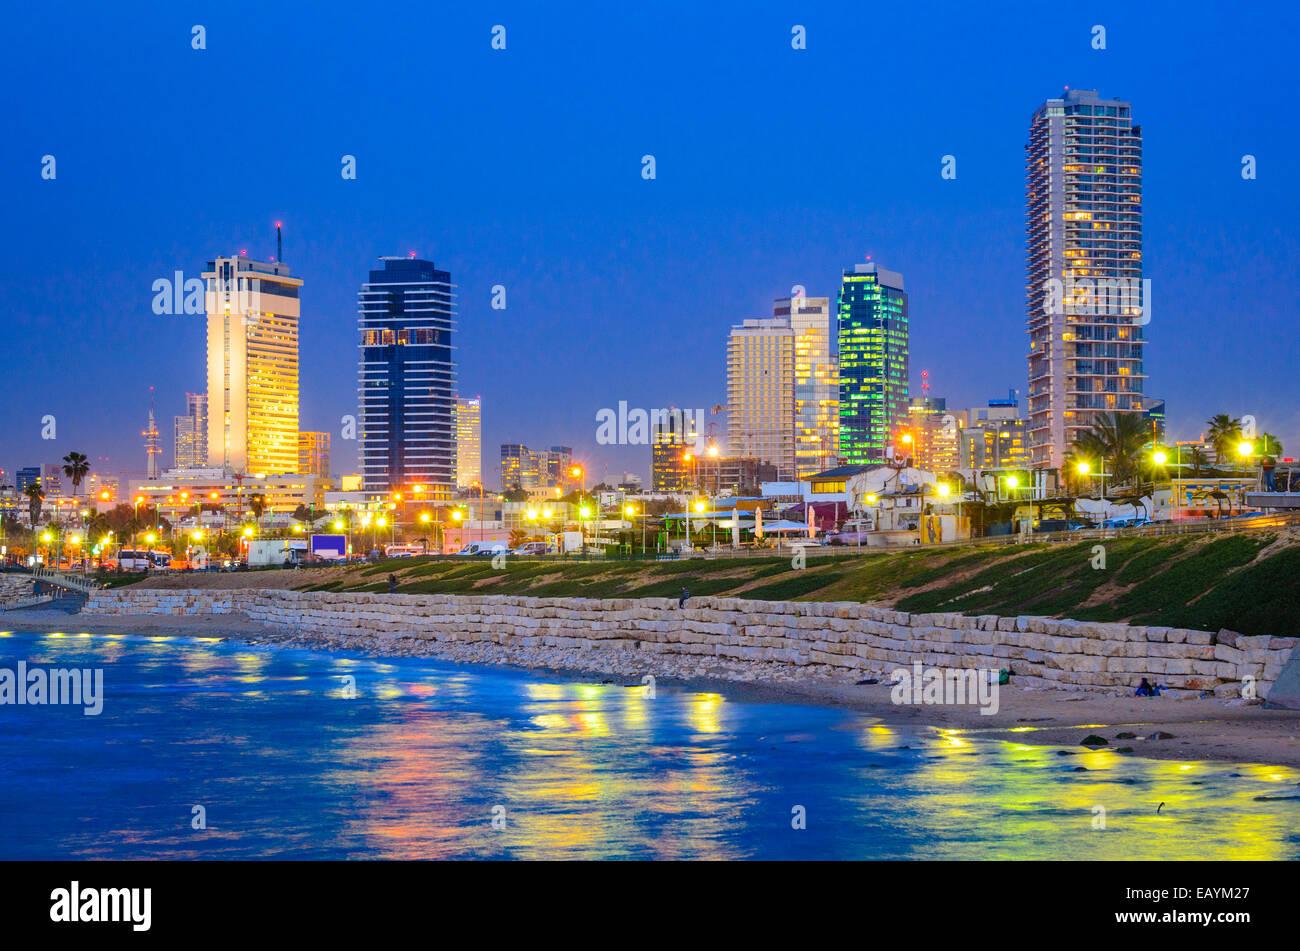 Tel Aviv, Israel Skyline on the Mediterranean. - Stock Image